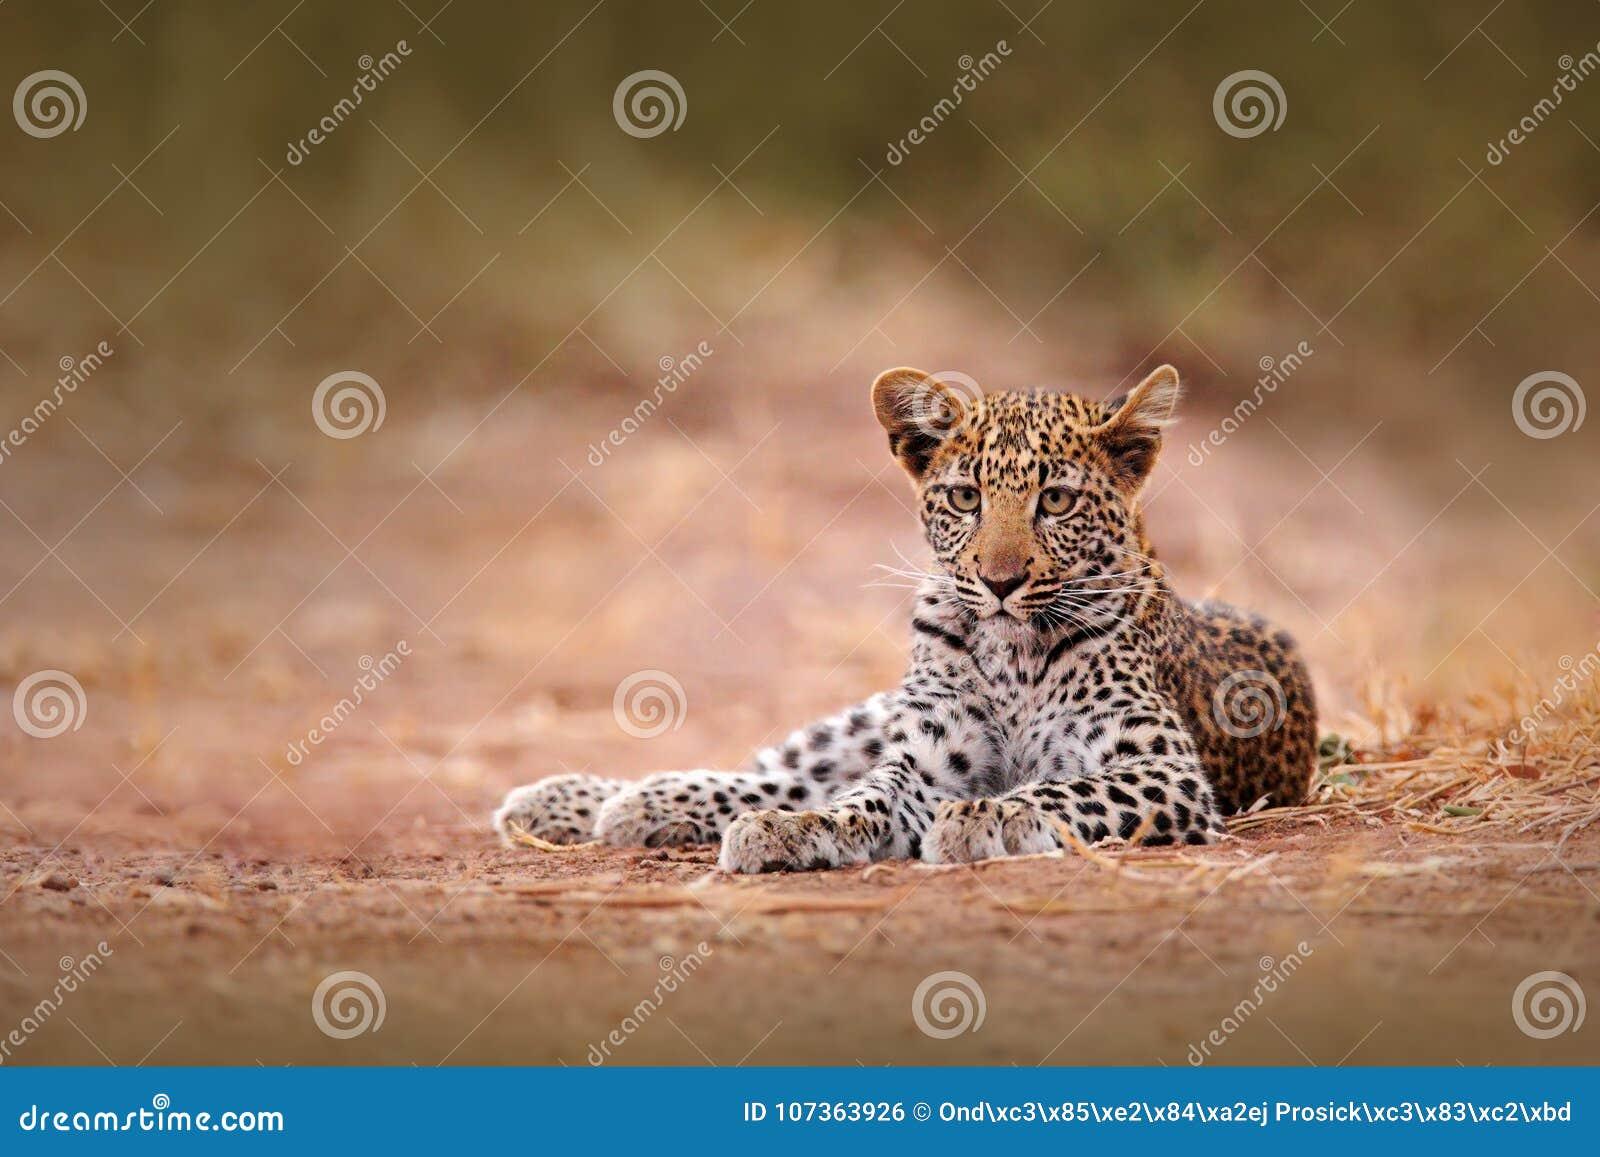 Young African Leopard, Panthera pardus shortidgei, Hwange National Park, Zimbabwe. Beautiful wild cat sitting on the gravel road i